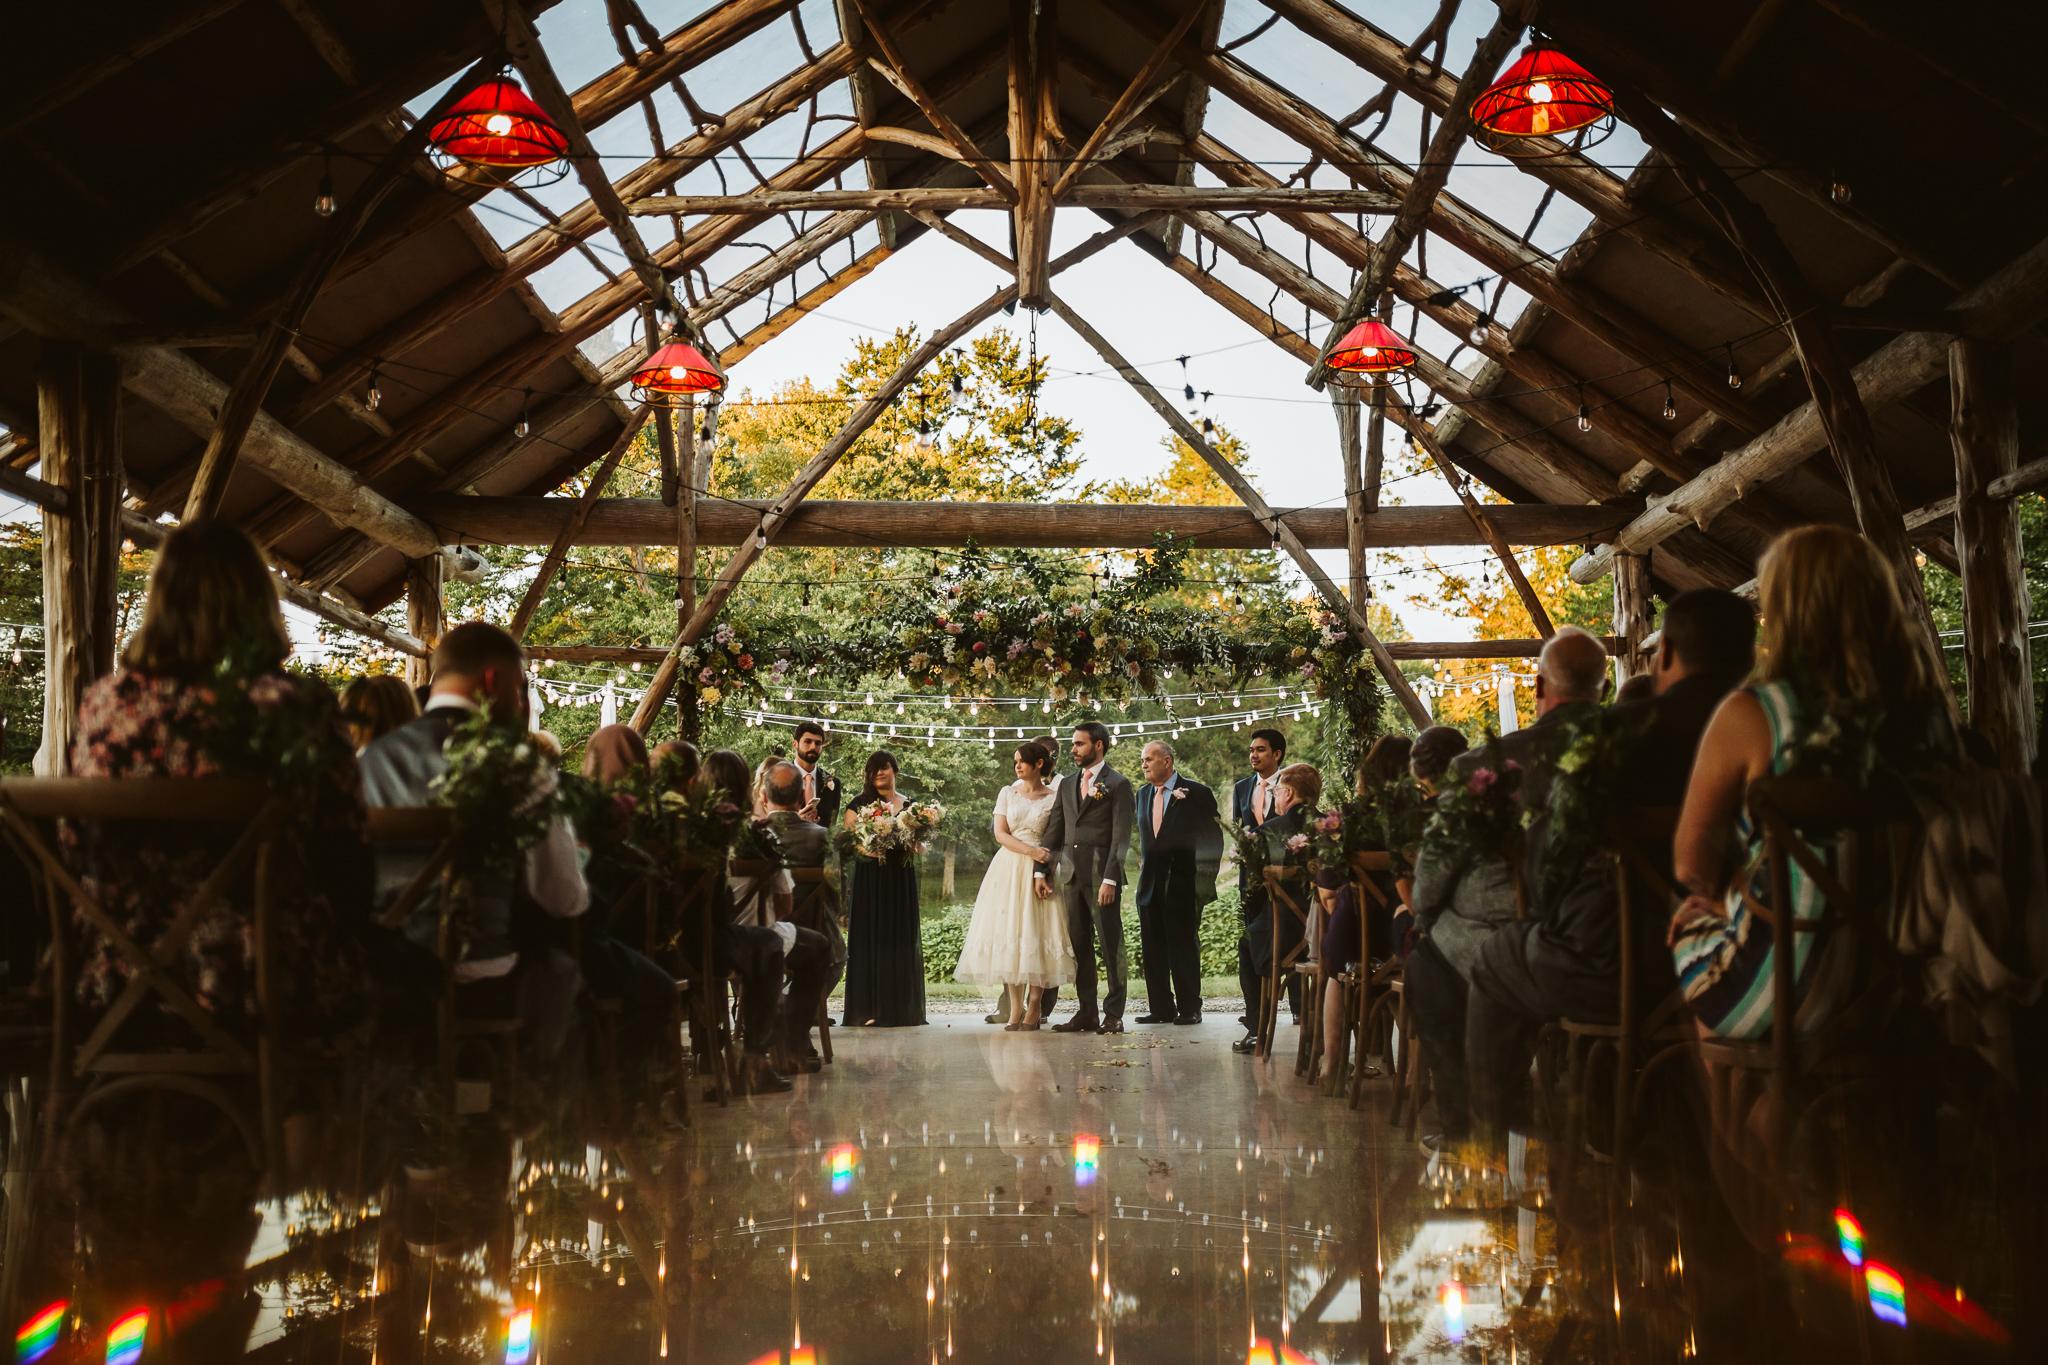 Wollam_gardens_wedding50.JPG